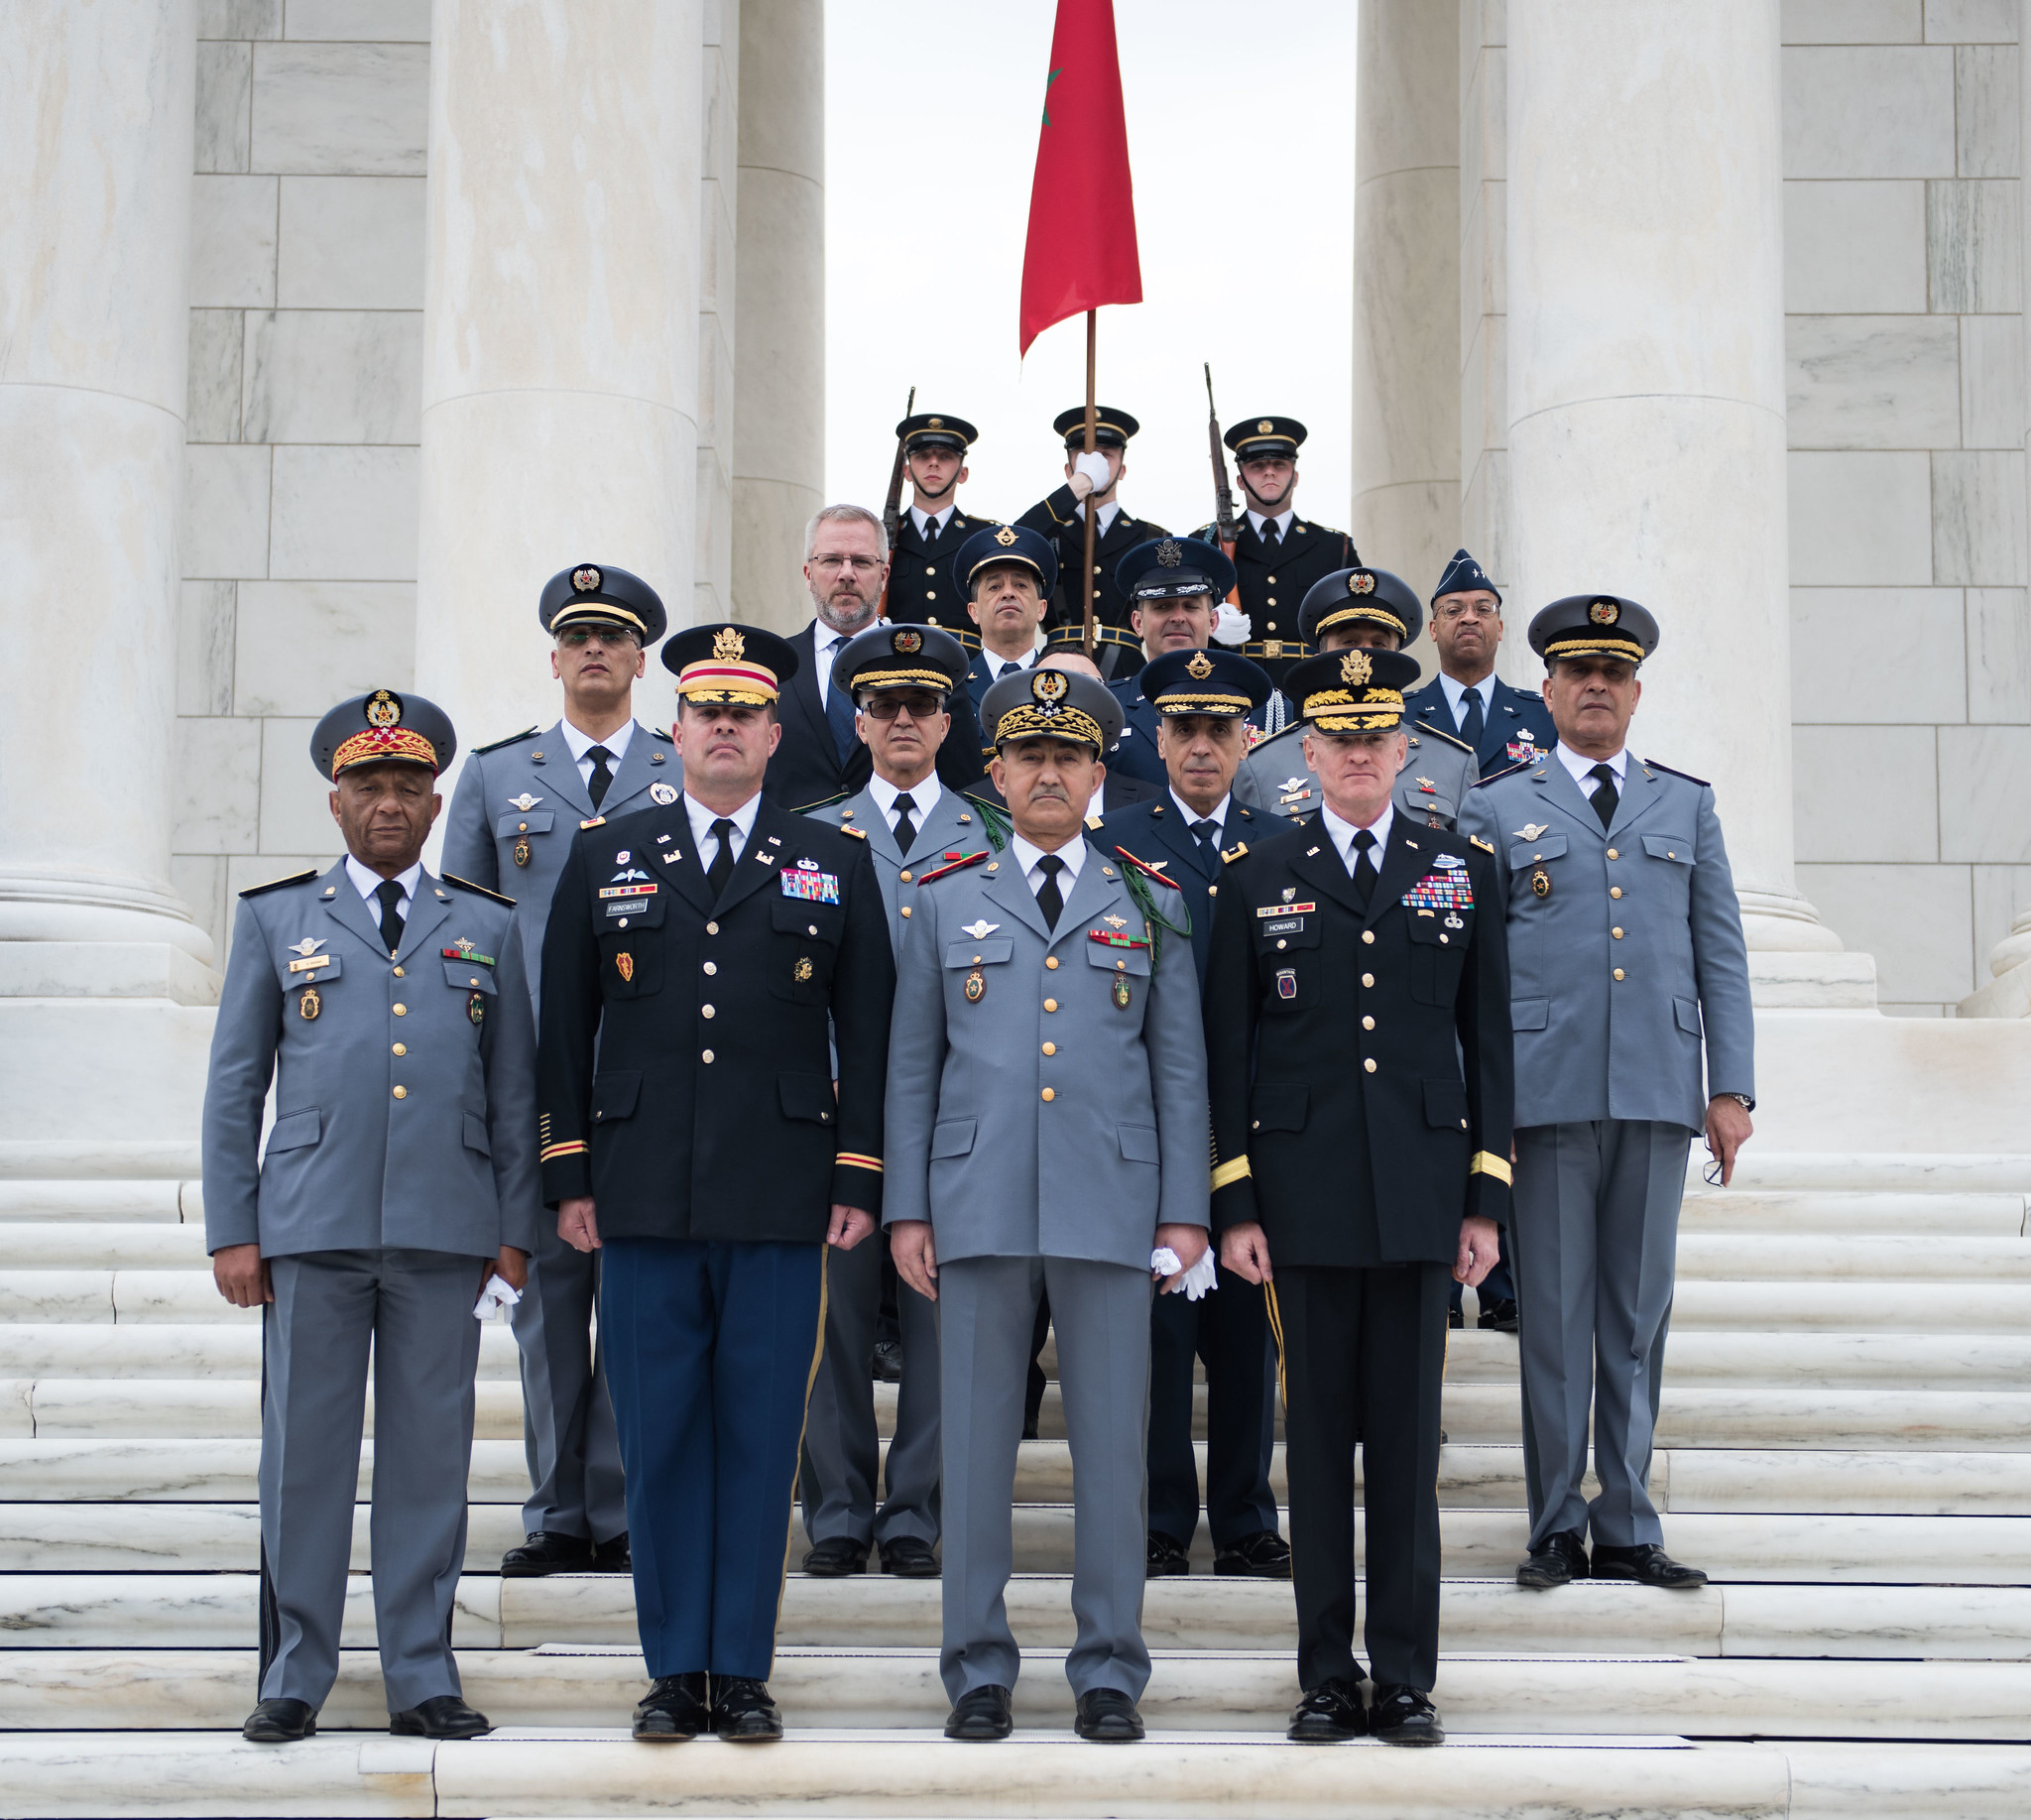 Cooperation militaire avec les USA - Page 5 27545003958_8a2d295ee0_k